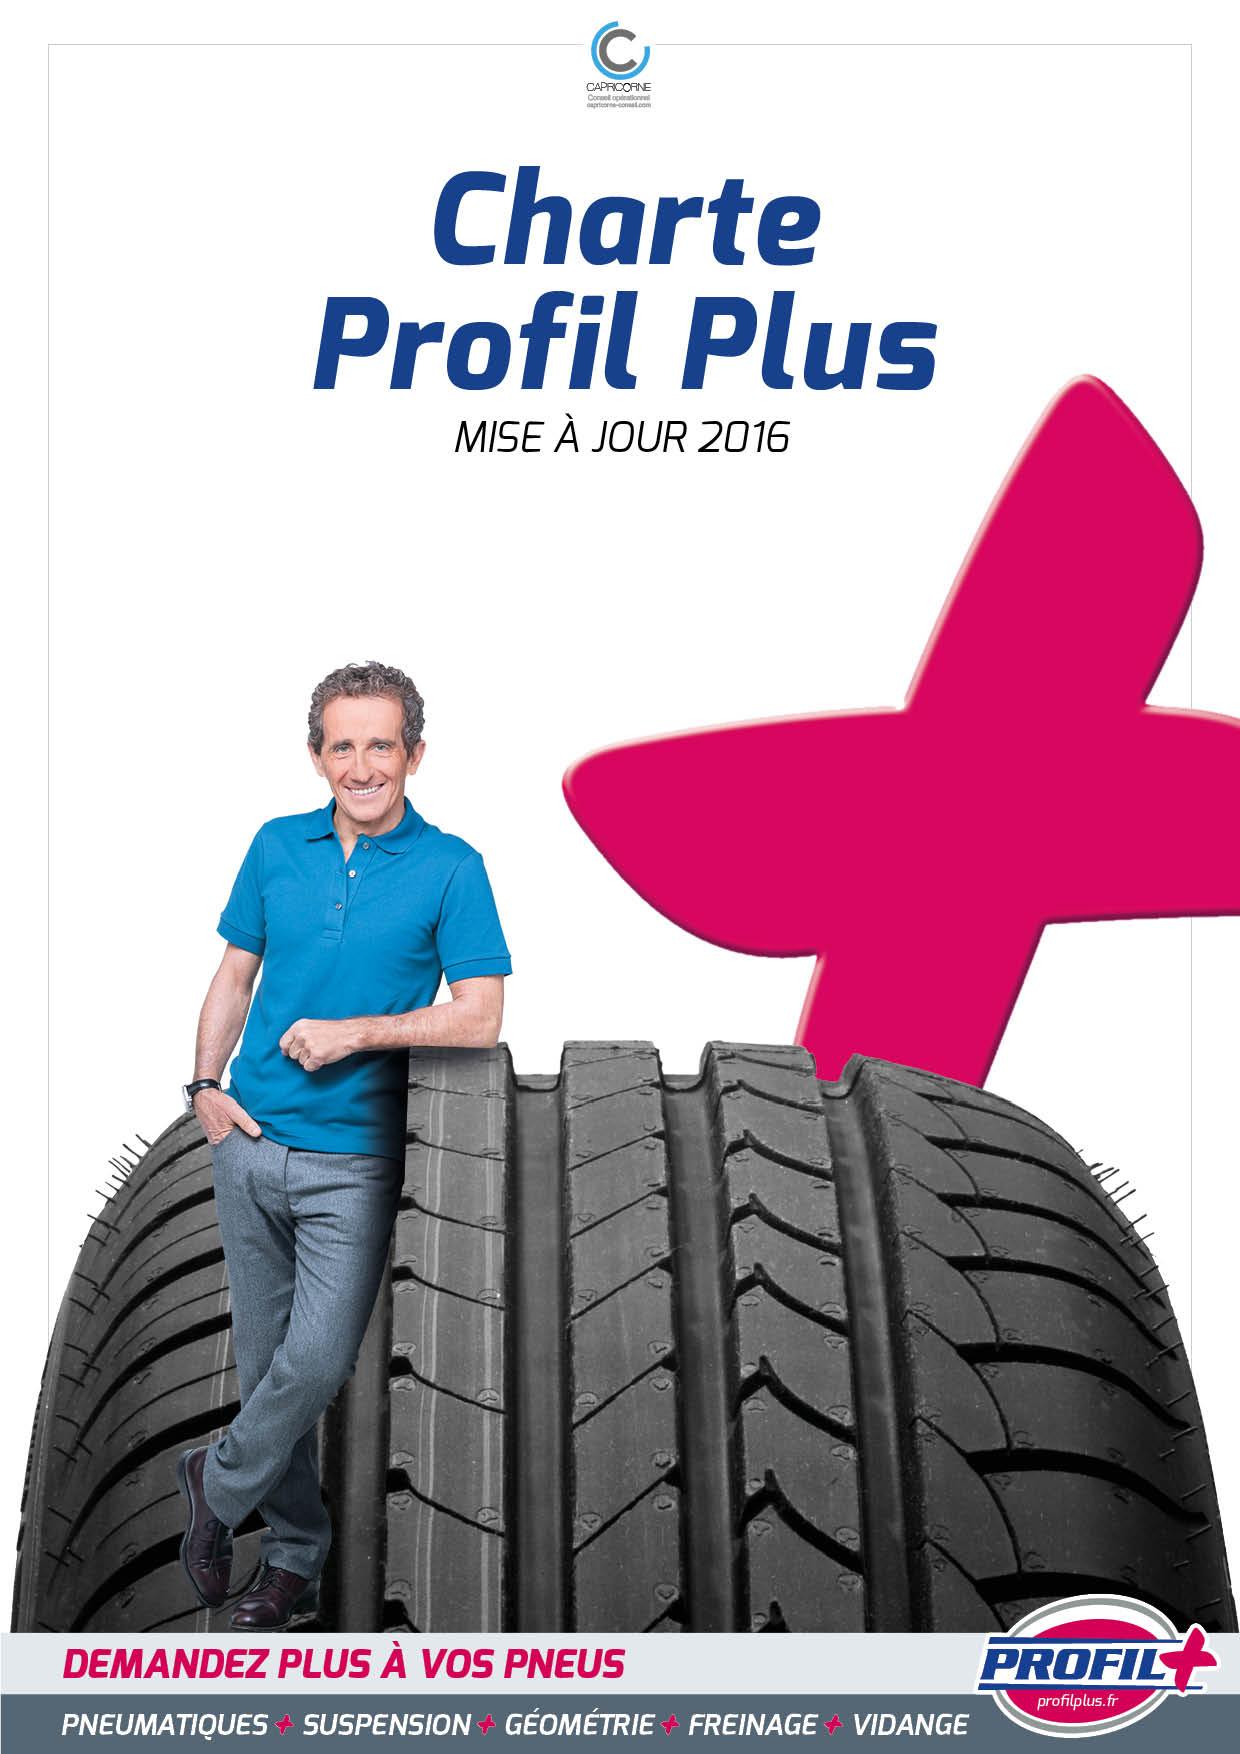 CHARTE PROFIL PLUS 2016